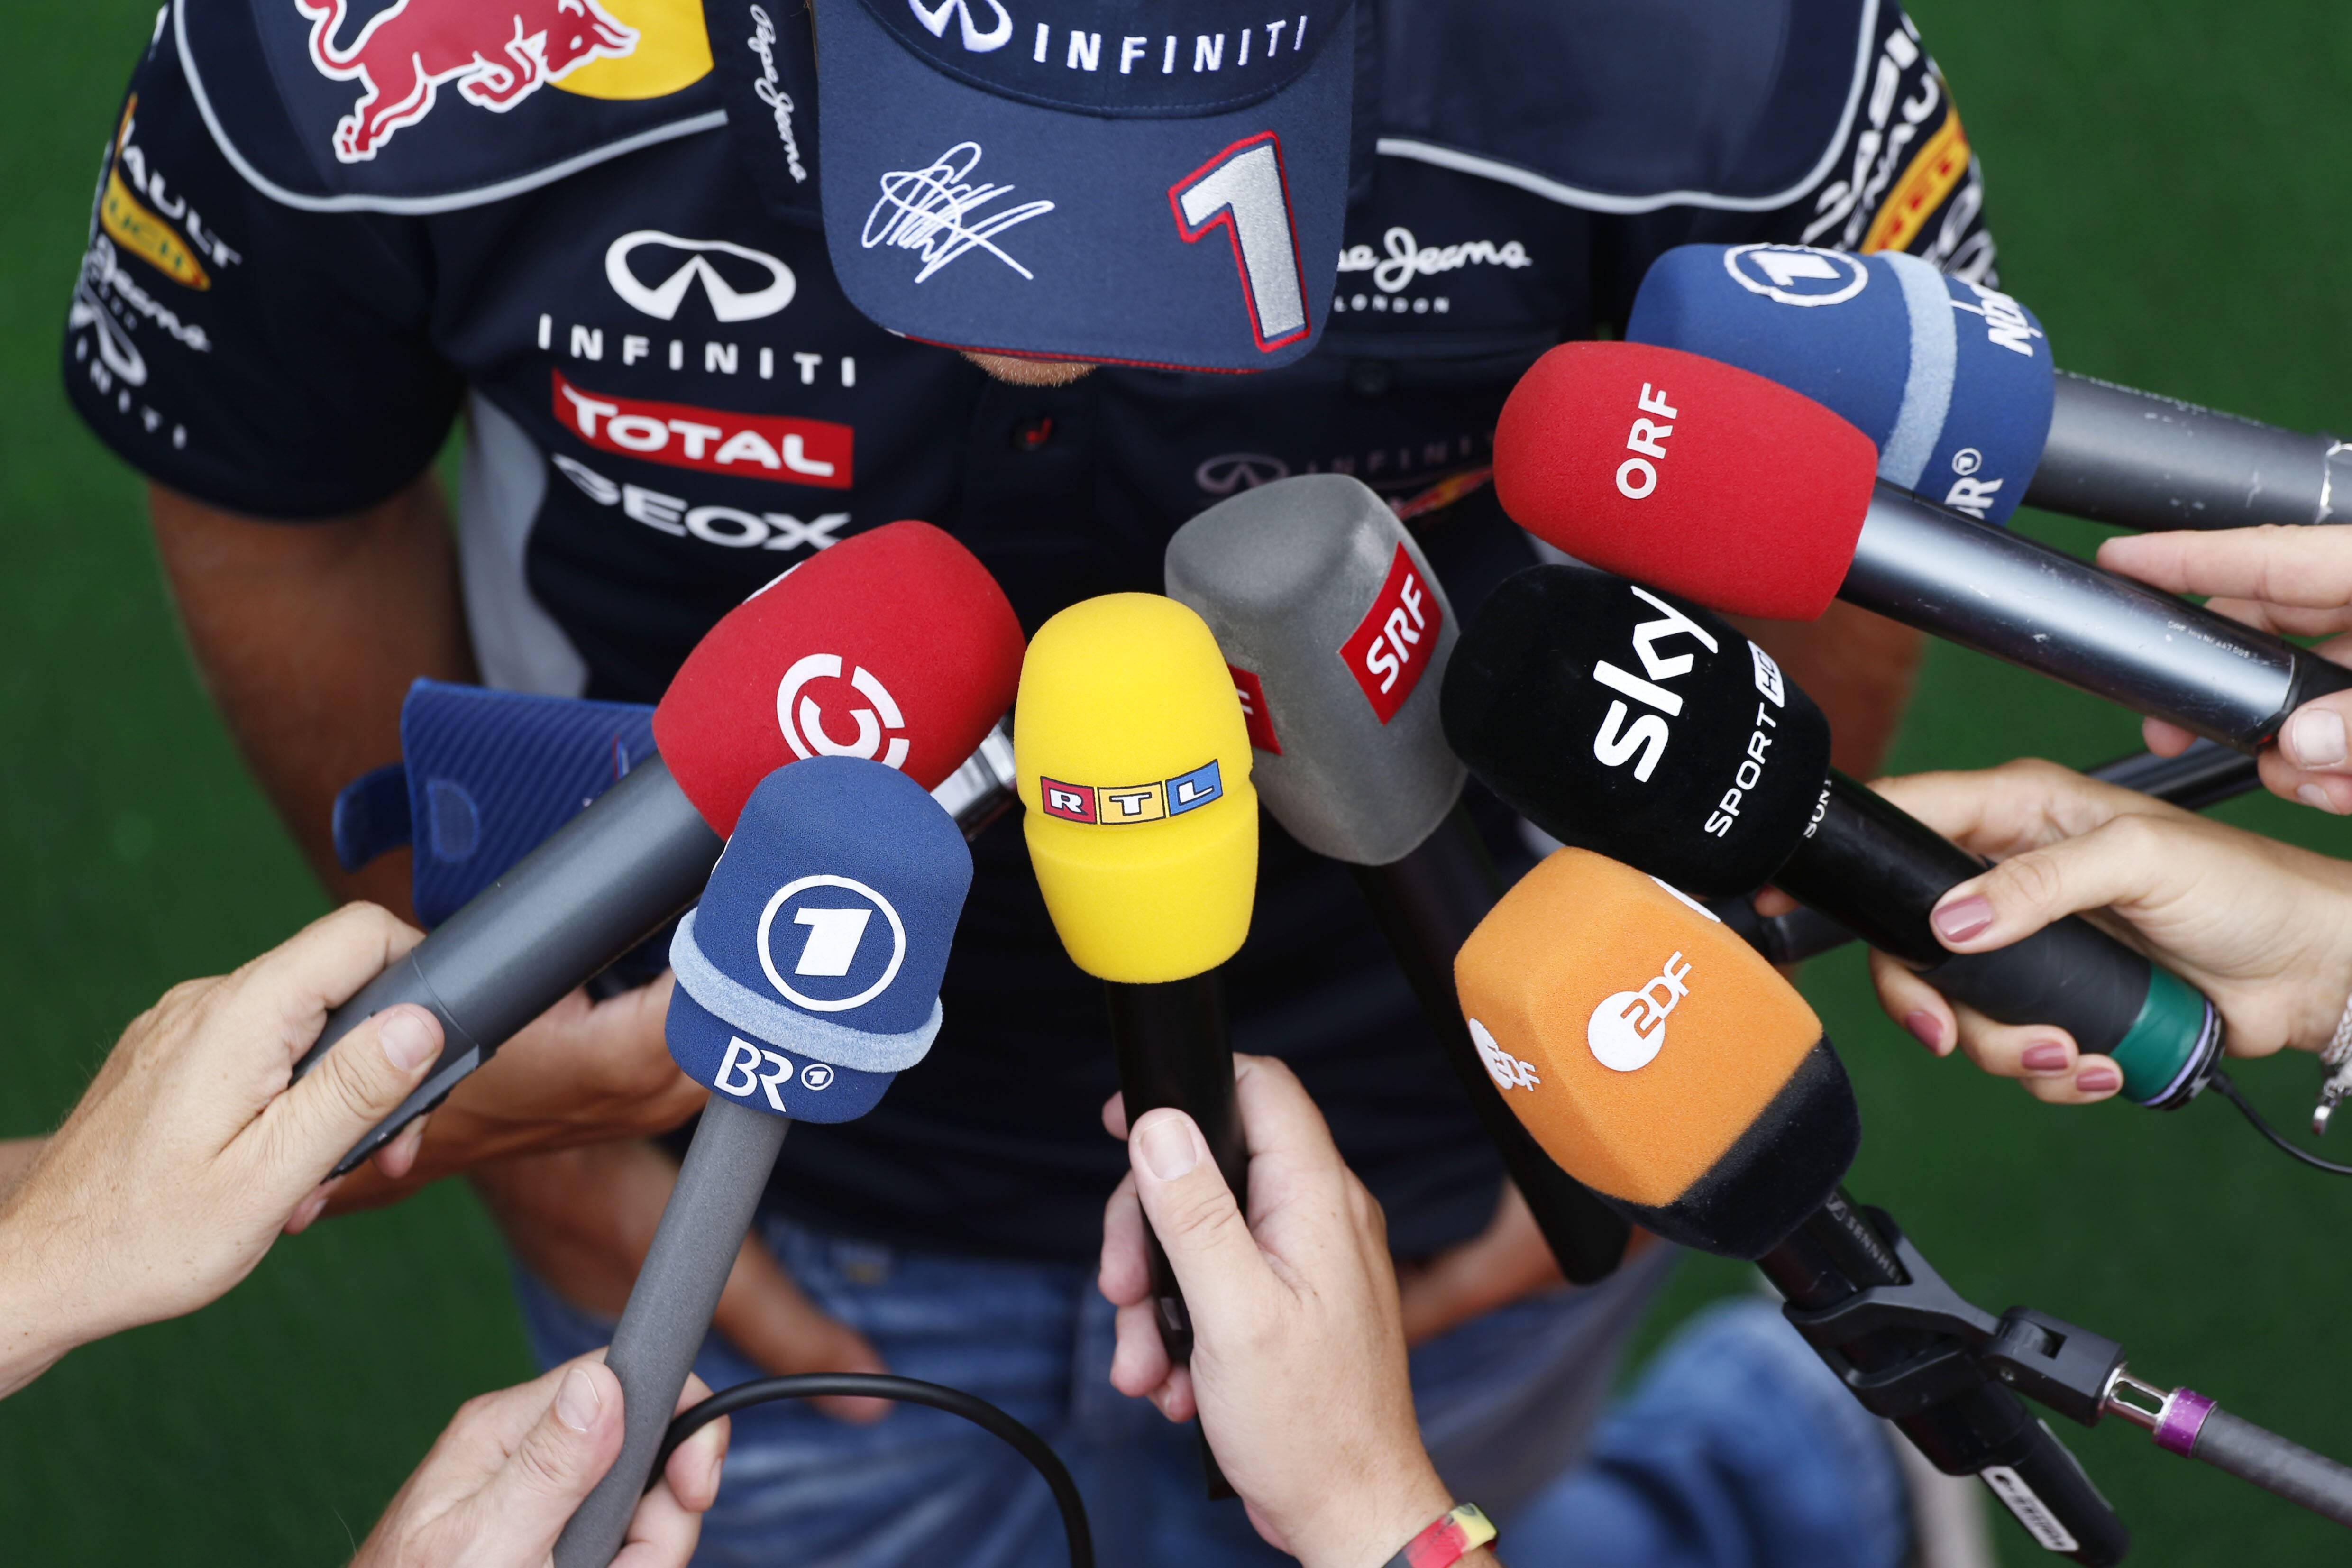 Bild zu Netflix, Formel 1, Sebastian Vettel, TV-Rechte